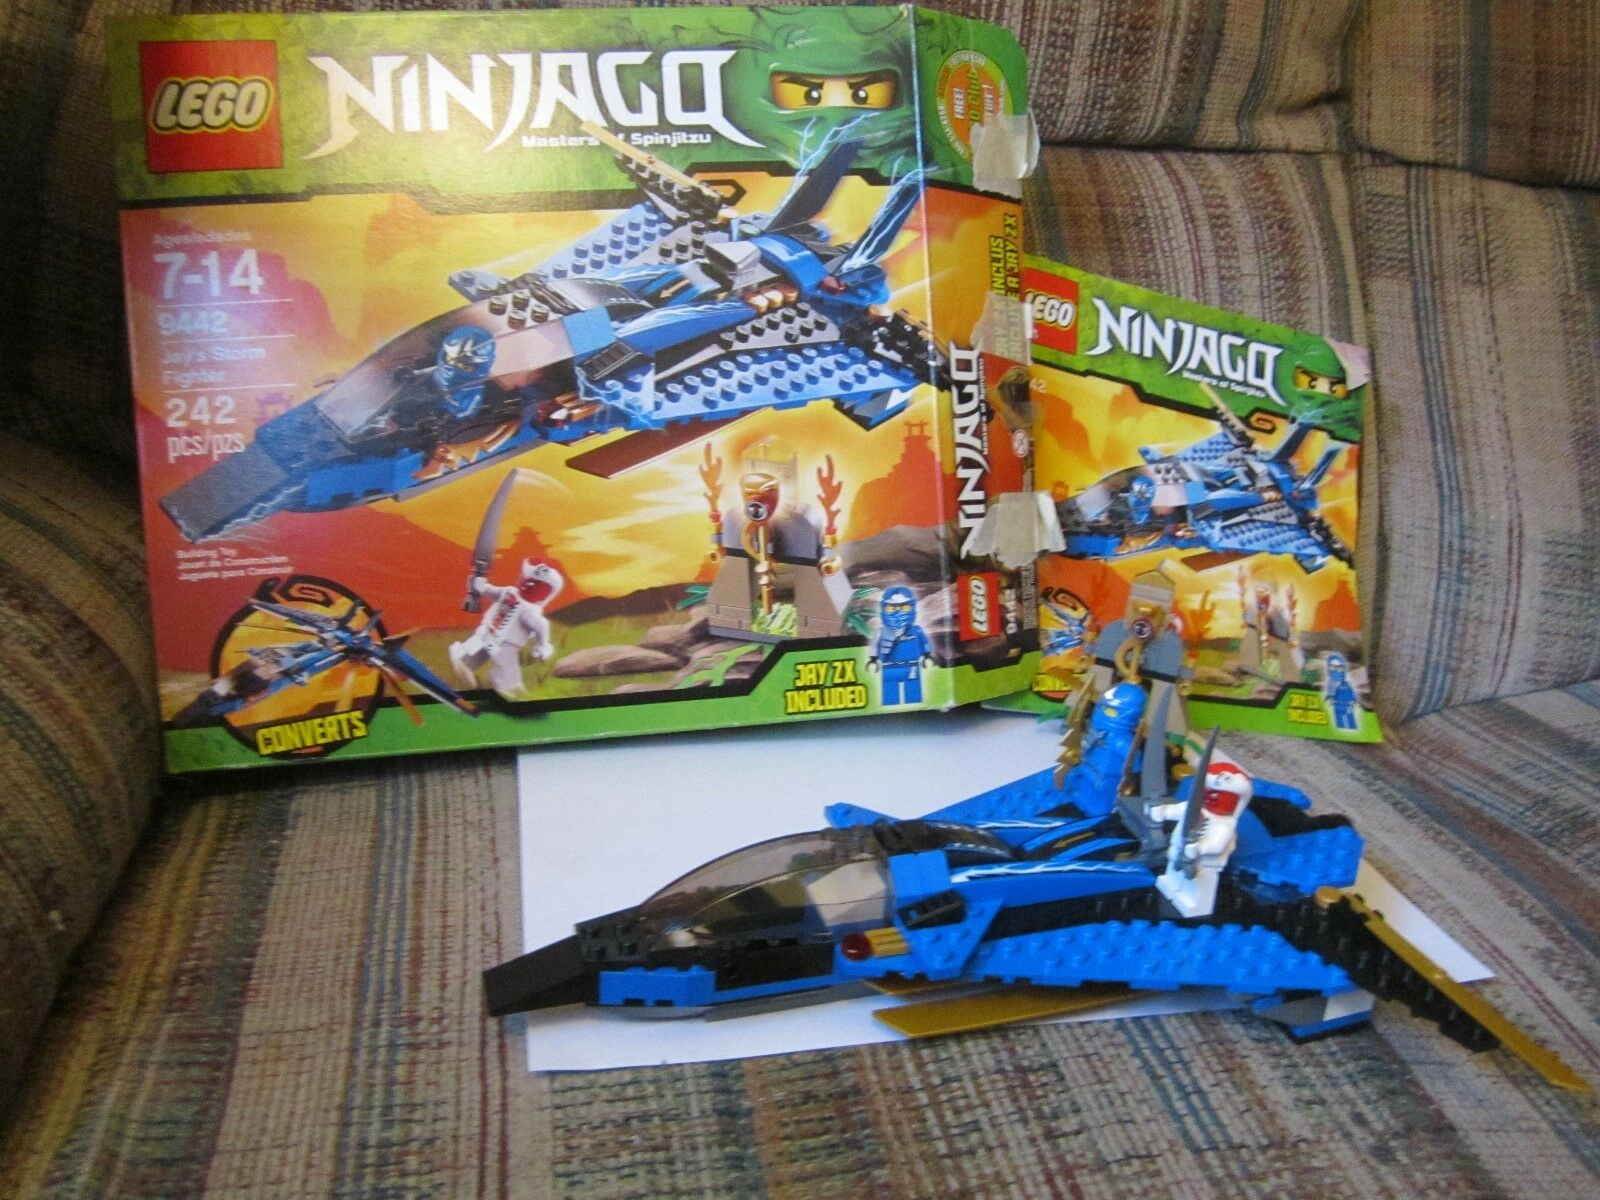 Lego 9442 Ninjago Jay's Storm Fighter with Box Minifigures